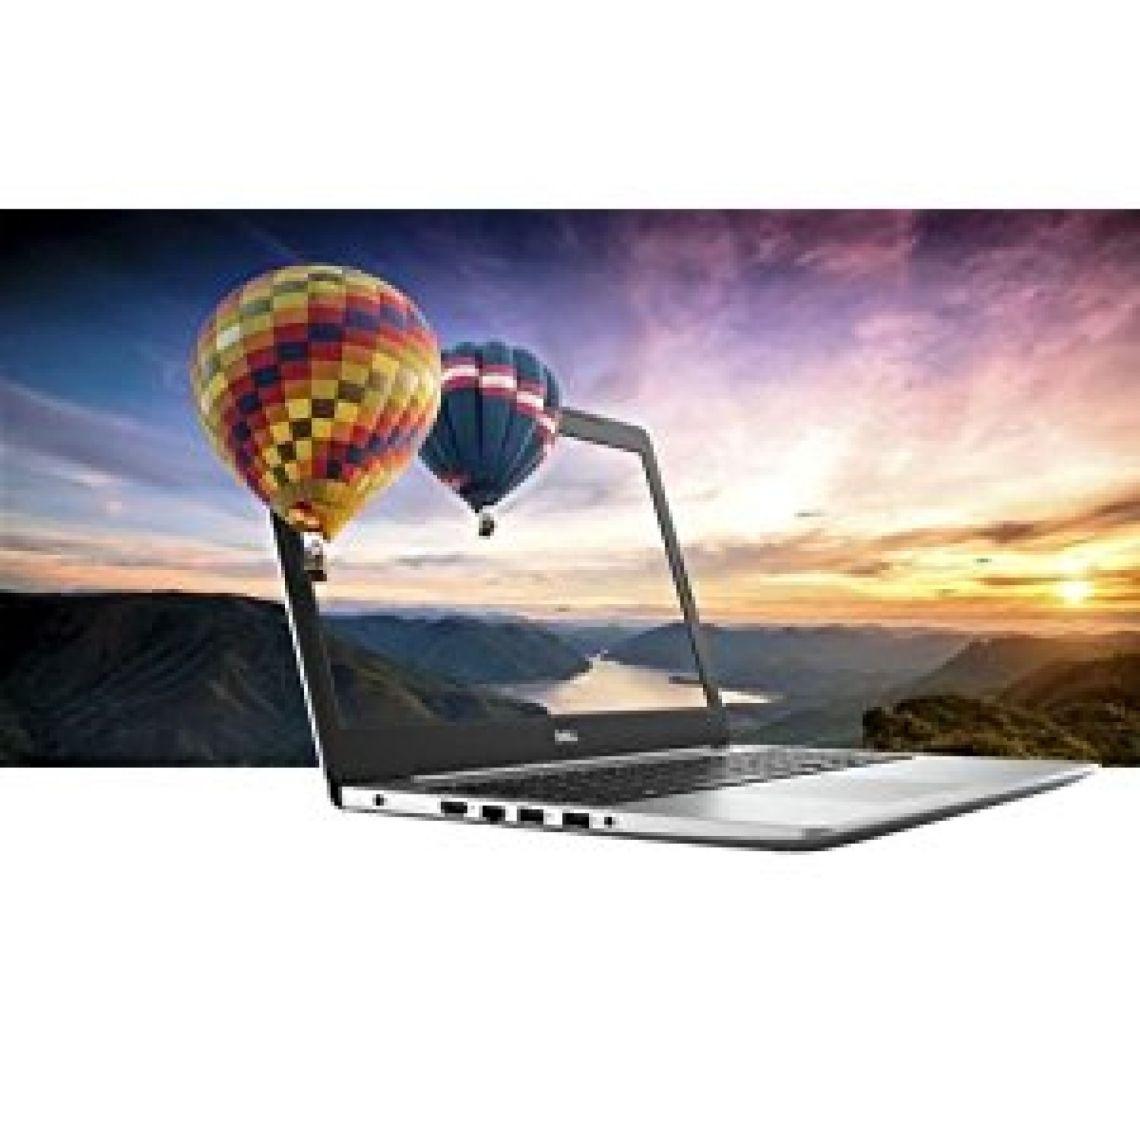 "Amazon.com: Dell i5575-A217SLV-PUS Inspiron 15 5575 - LED-Backlit Display - AMD Ryzen 5 - Radeon Vega8 Graphics - 8GB Memory - 1TB Hard Drive, 15.6"", Platinum Silver: Computers & Accessories"